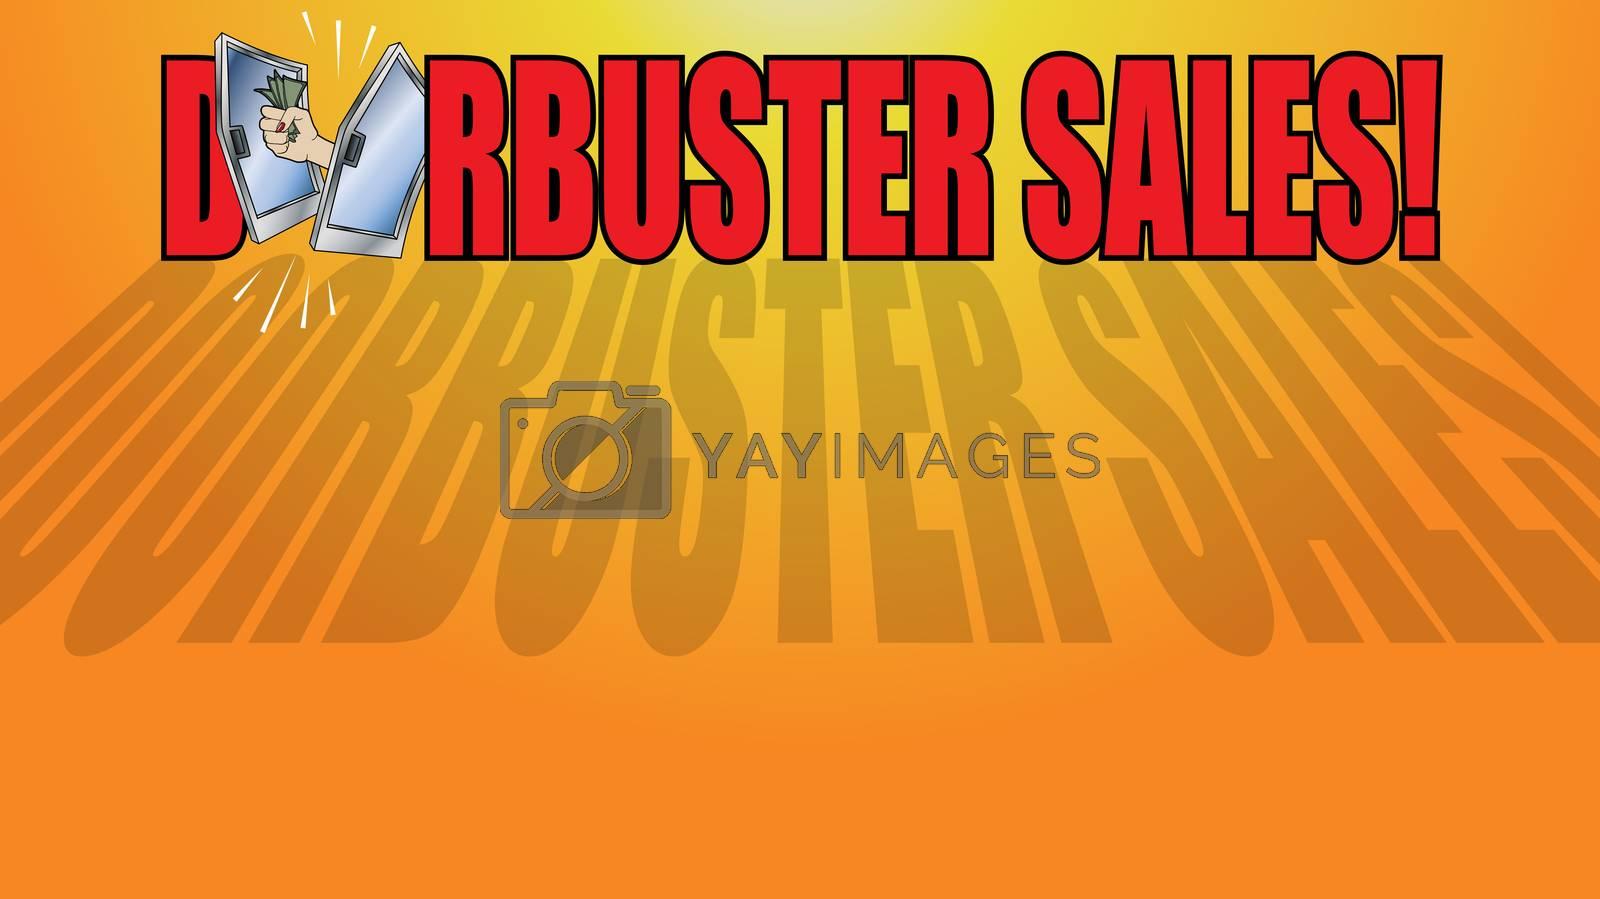 Doorbuster Sale Copy Logo on Orange Background